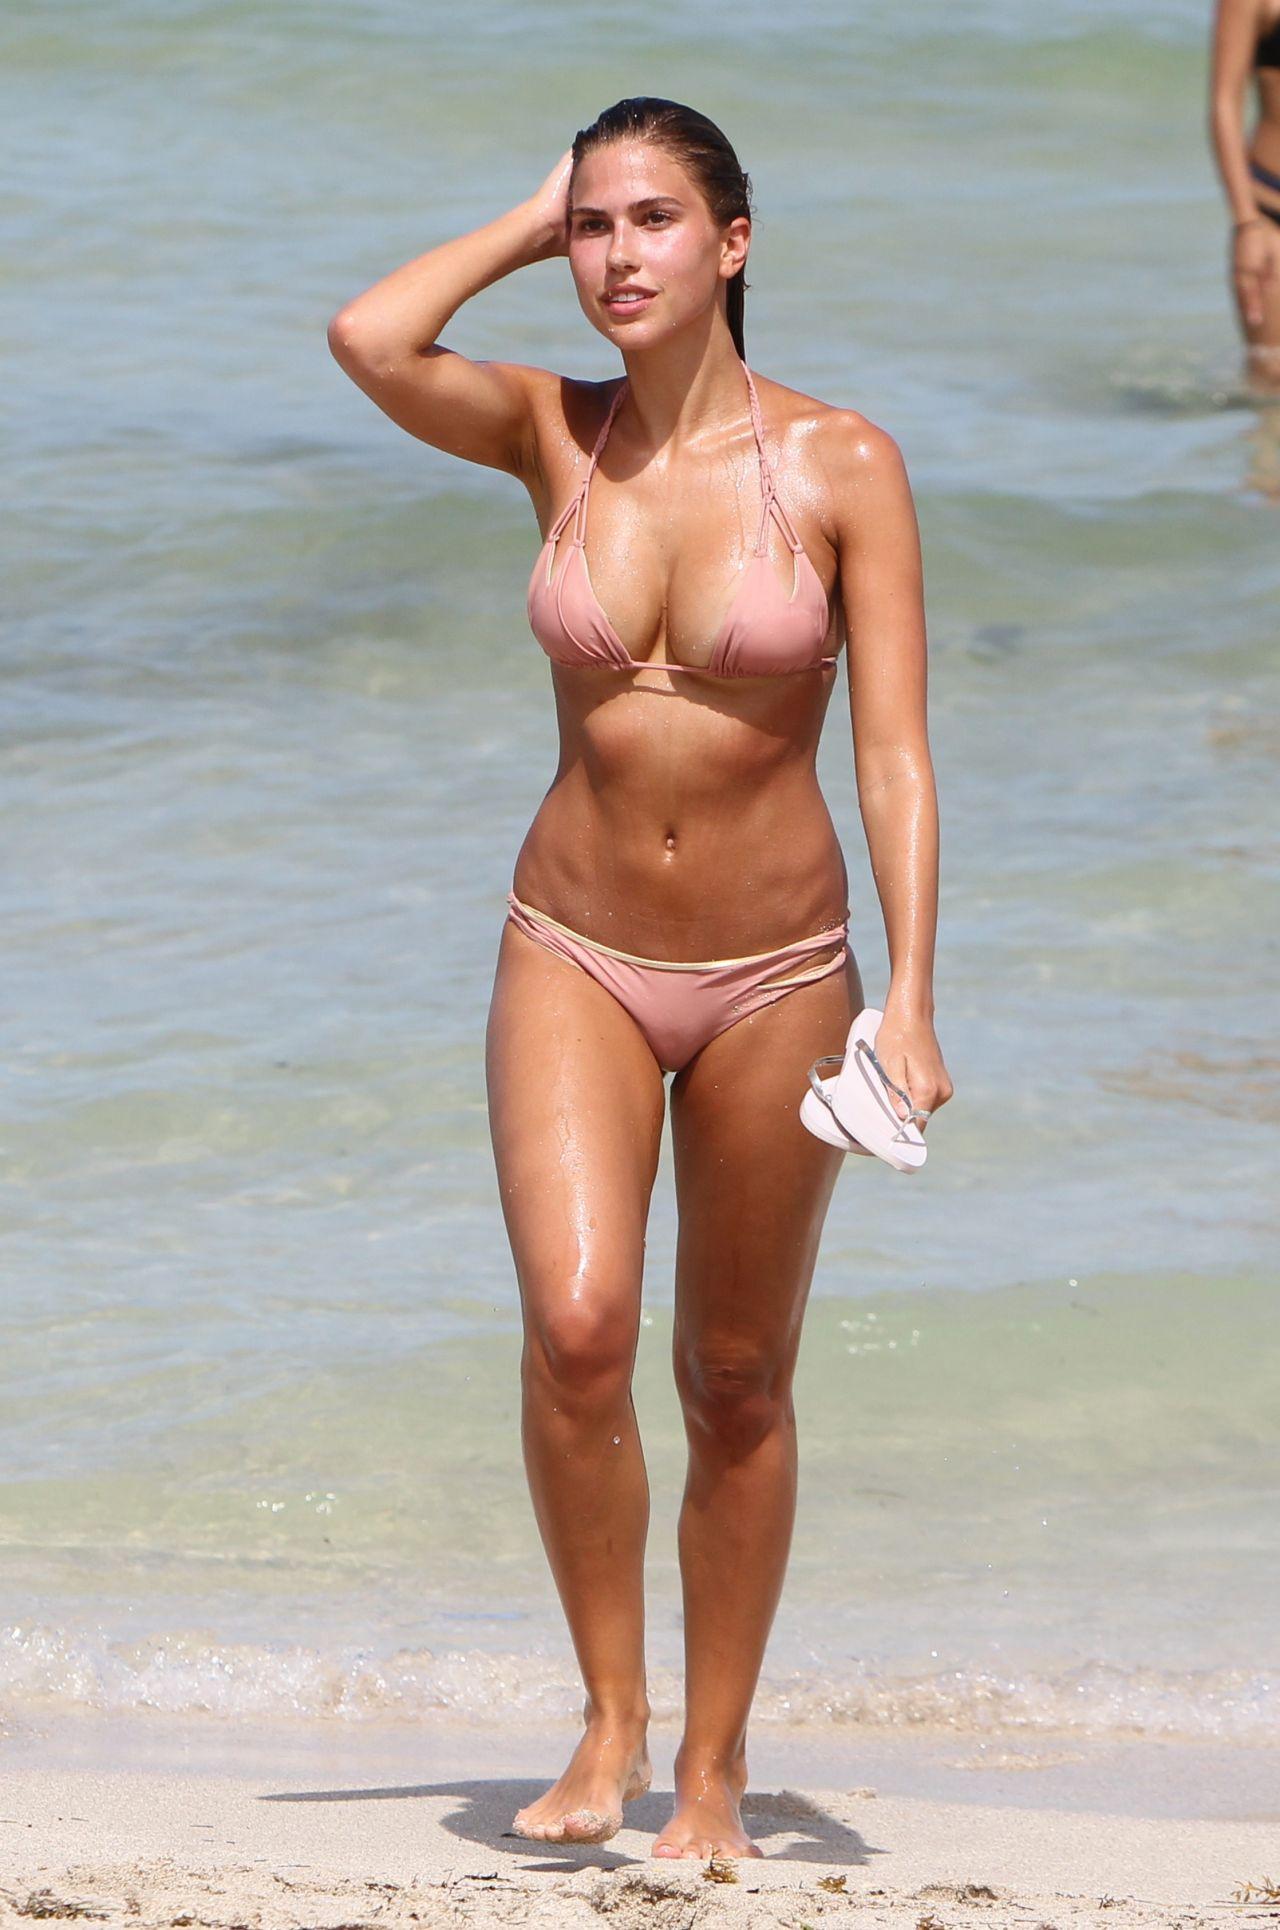 Kara Del Toro Bikini Photoshoot - Miami Beach 07242017-1326